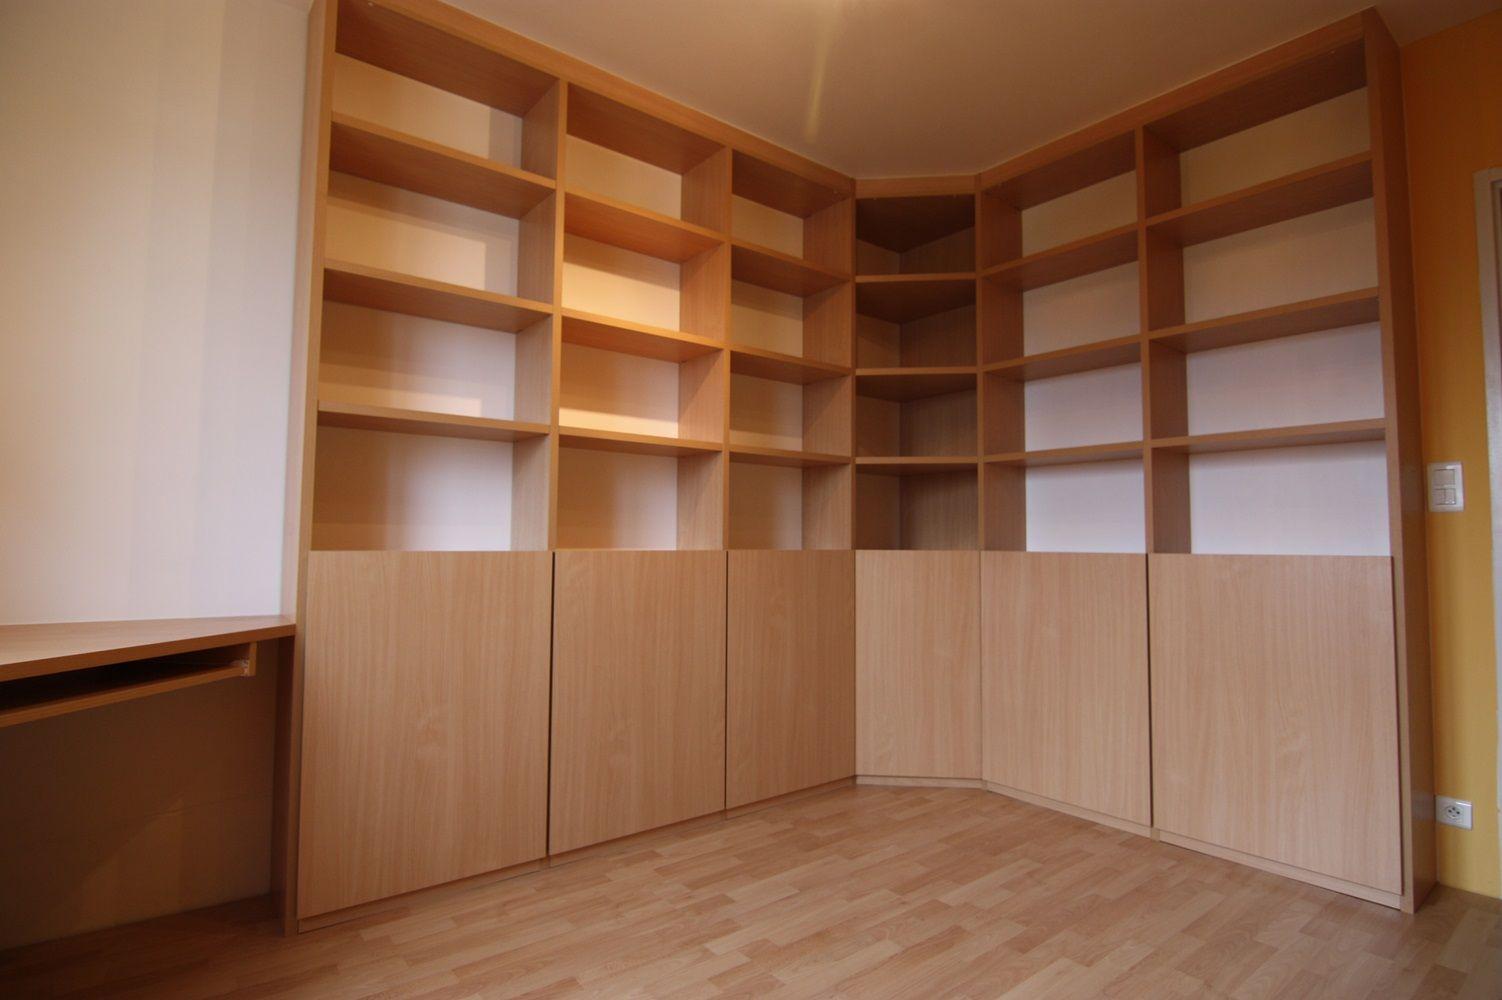 Bibliotheque Sur Mesure Chambery Bibliotheque Bibliotheque Sur Mesure Chambery